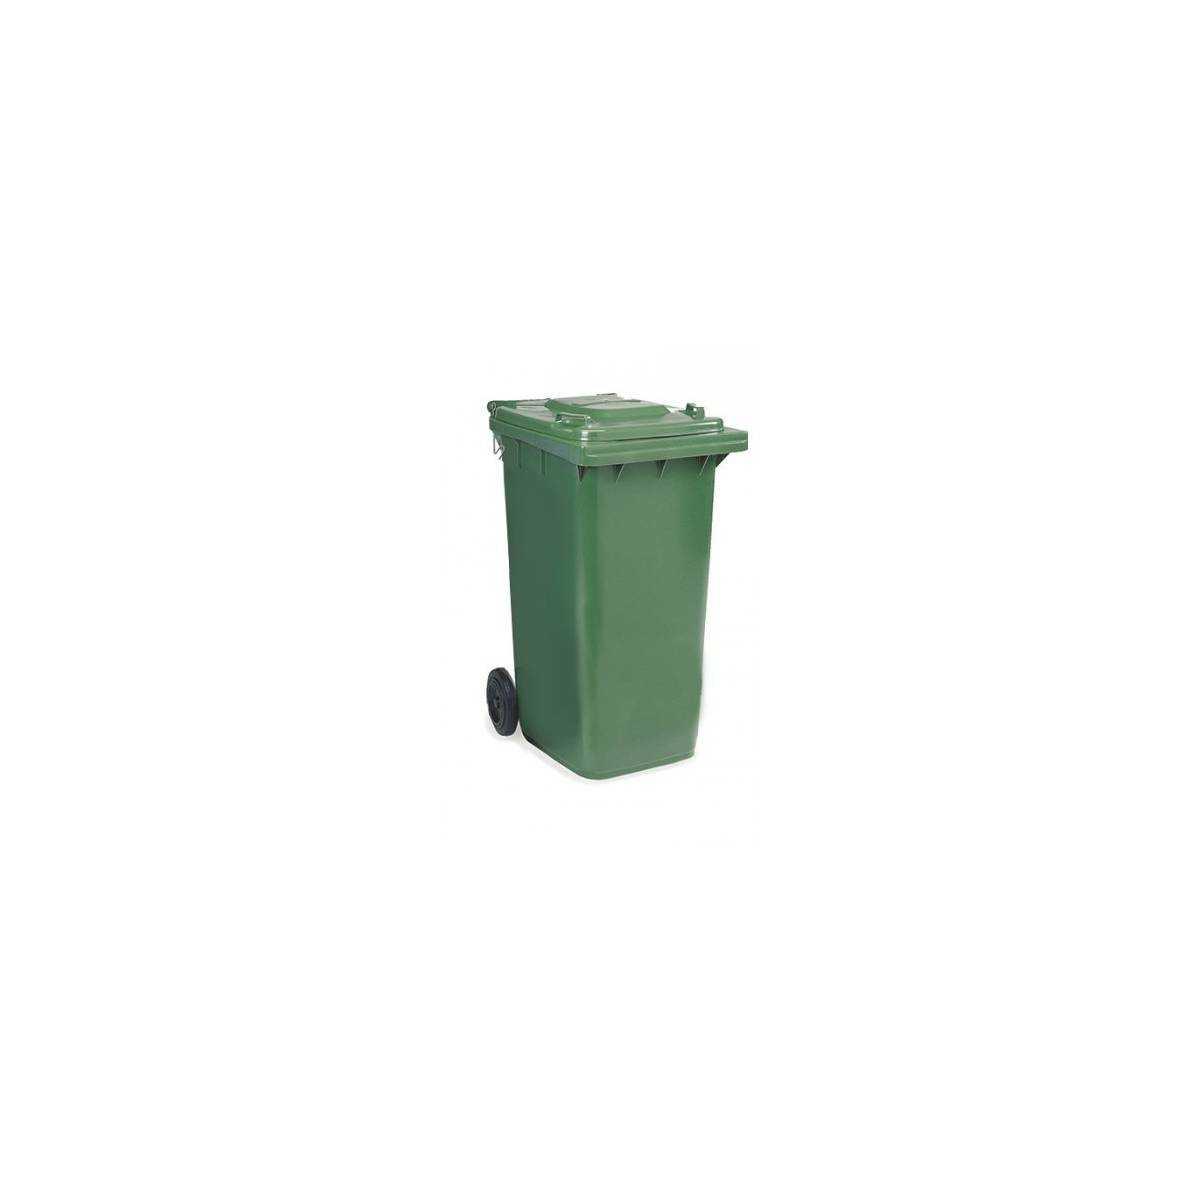 Контейнер для мусора 240л (5291G) 5291G Mar Plast